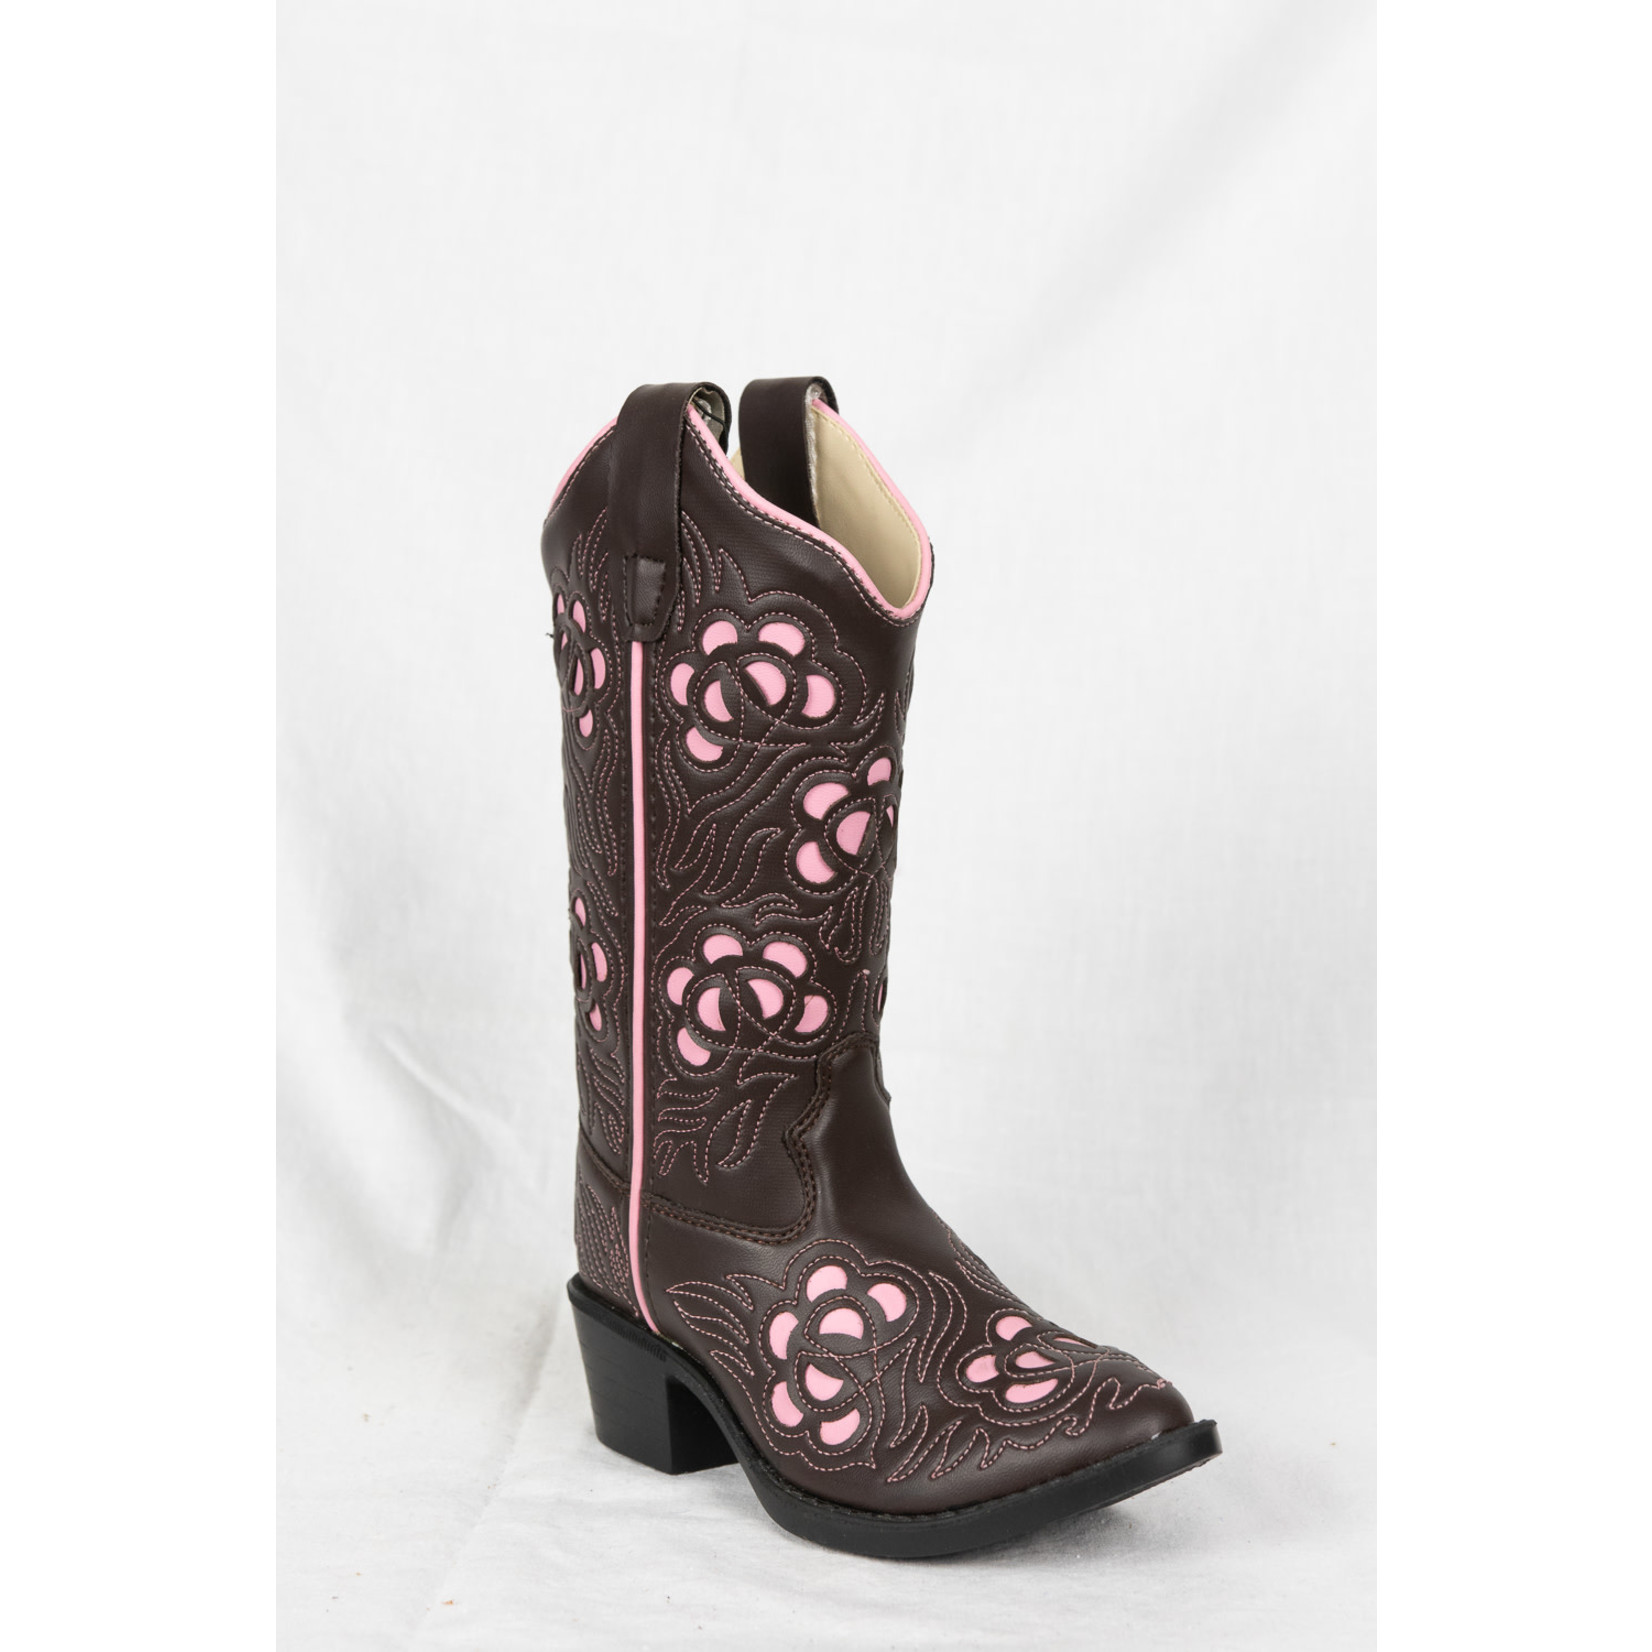 Old west Old West Brown Pink Children's Cowboy Boot VJ9114